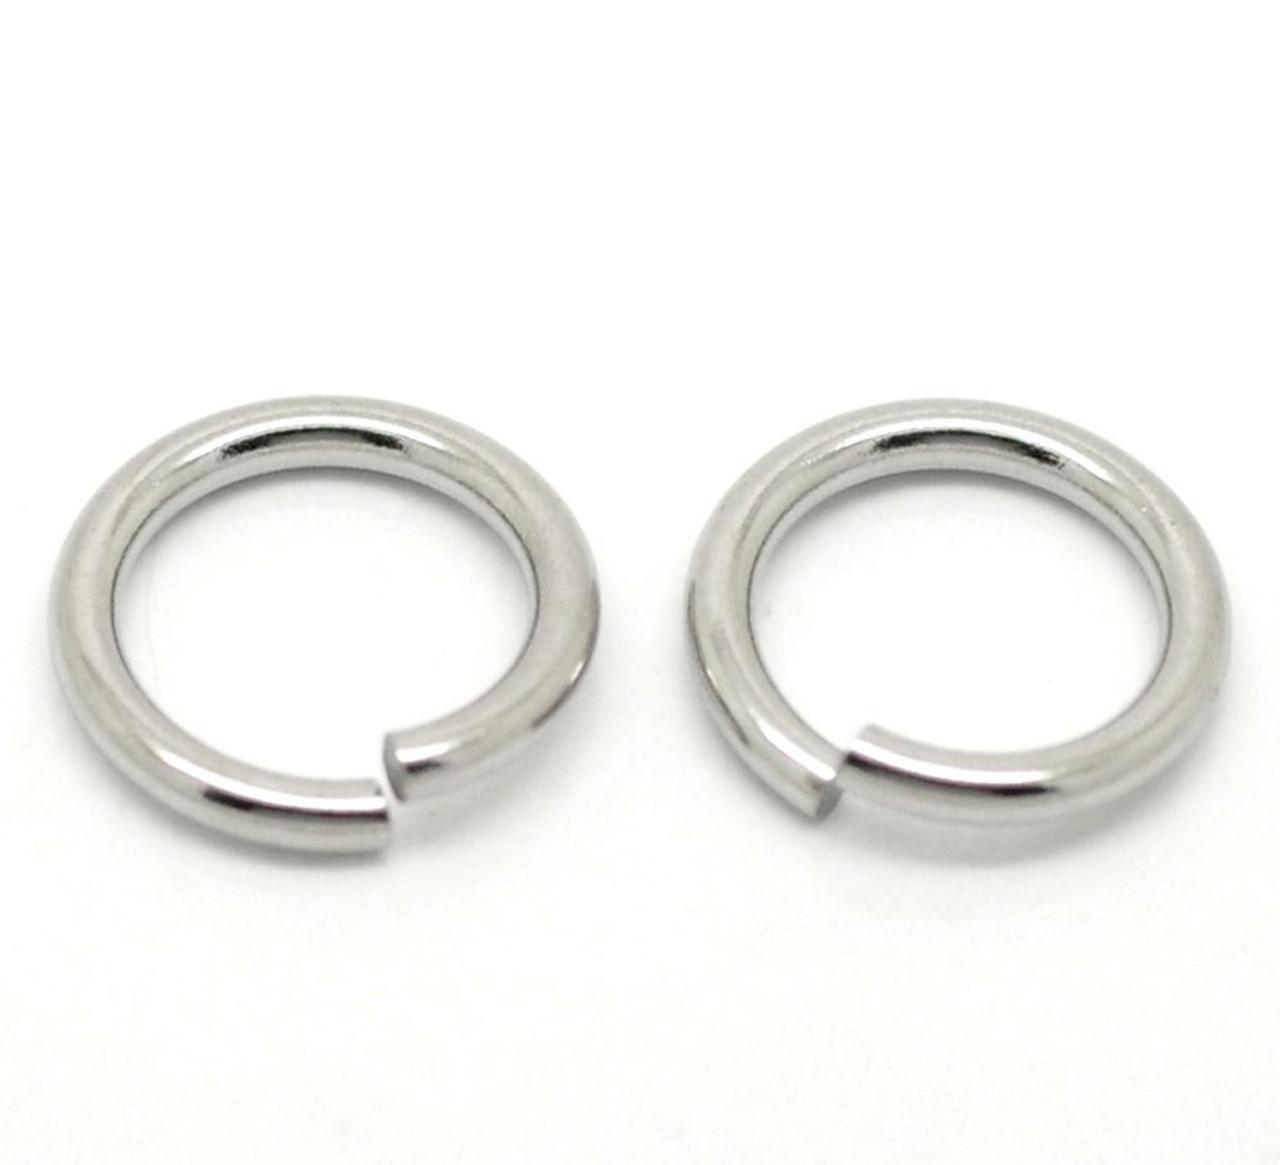 100 Split Ring Stainless Steel 6mm Round Spring Steel Thin Light Weight